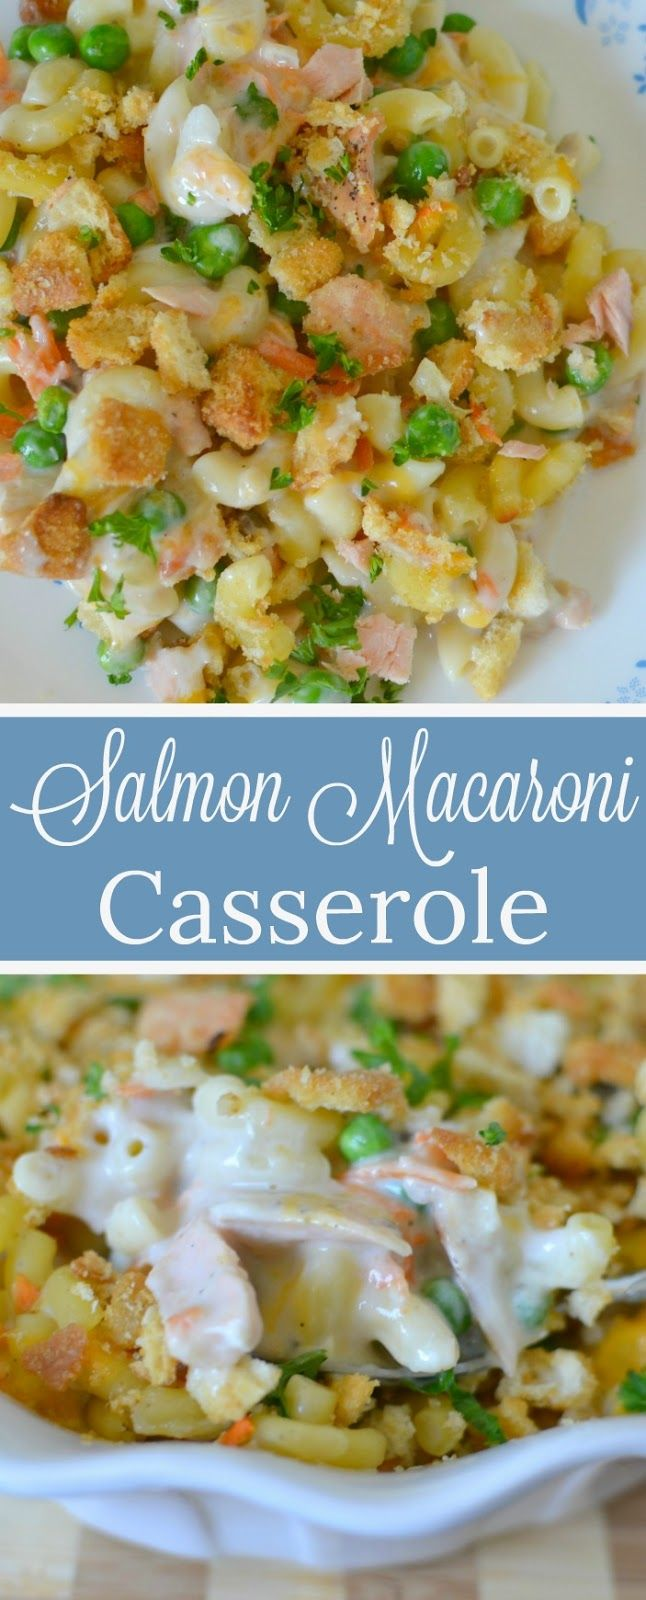 Salmon Macaroni Casserole #casserolerecipes